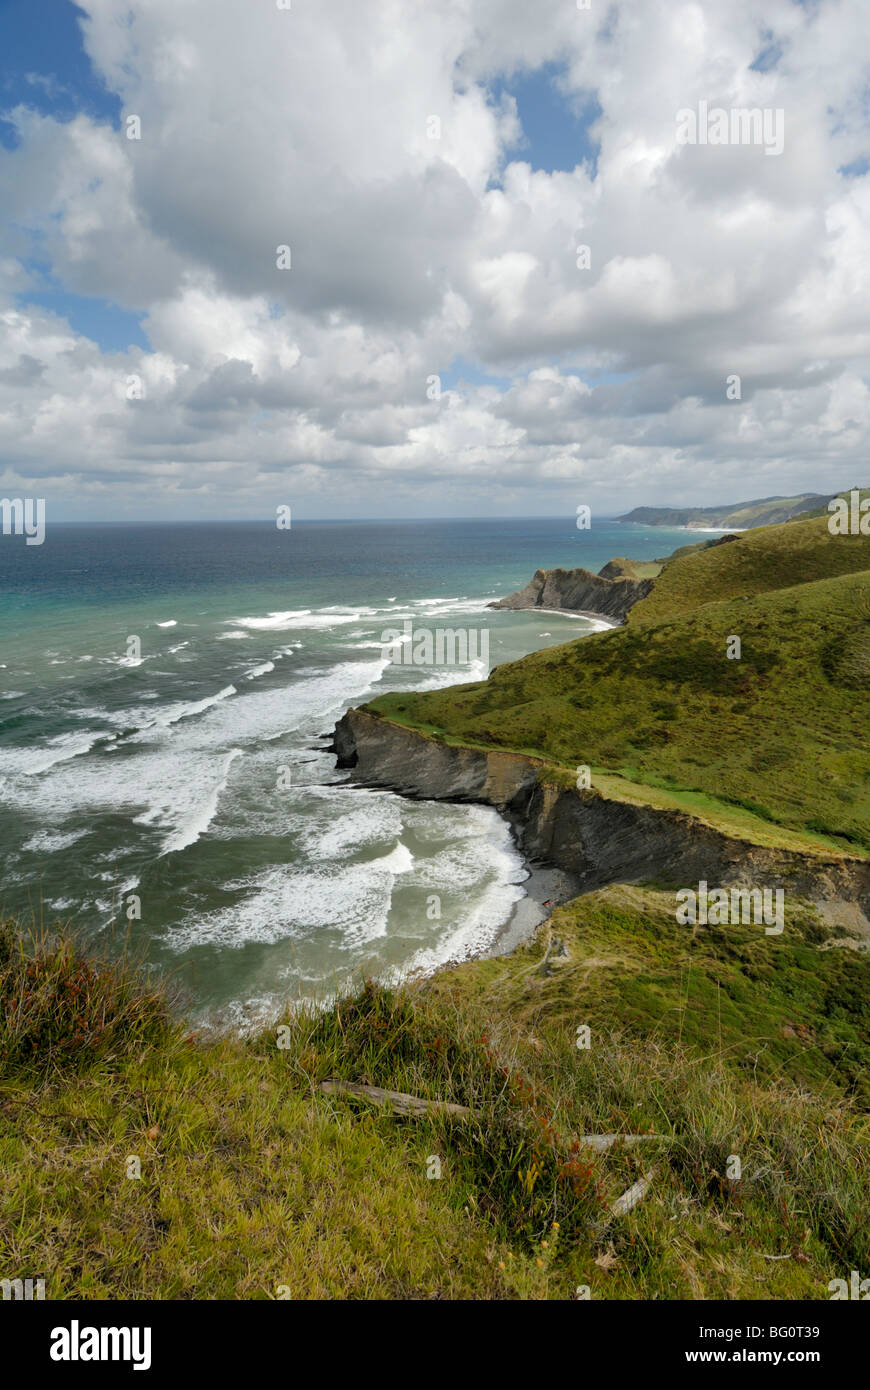 Basque Coast from high viewpoint, Costa Vasca, Euskadi, Spain, Europe - Stock Image